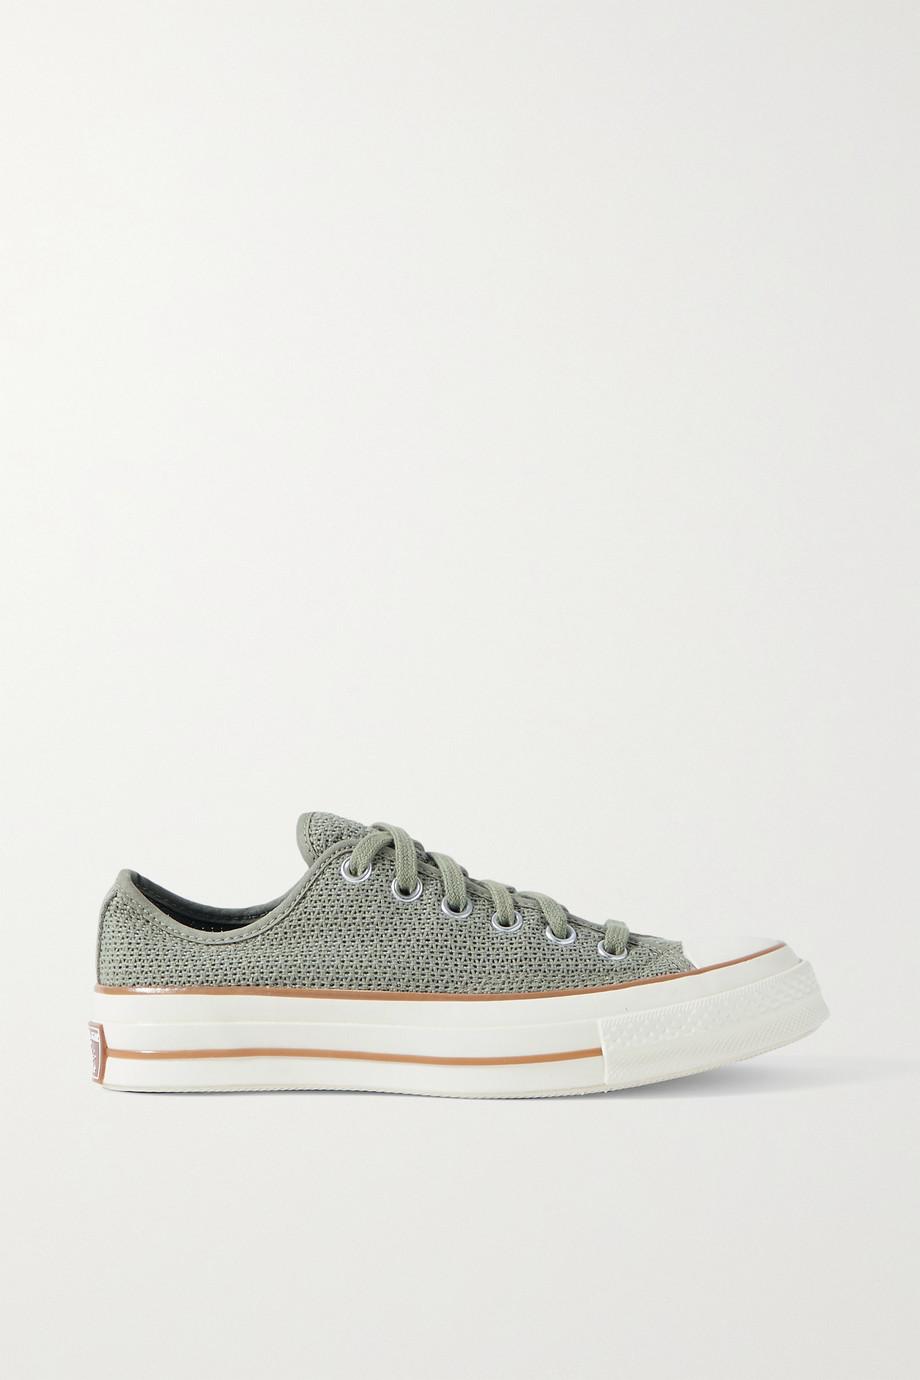 Converse Chuck 70 Breezy mesh sneakers